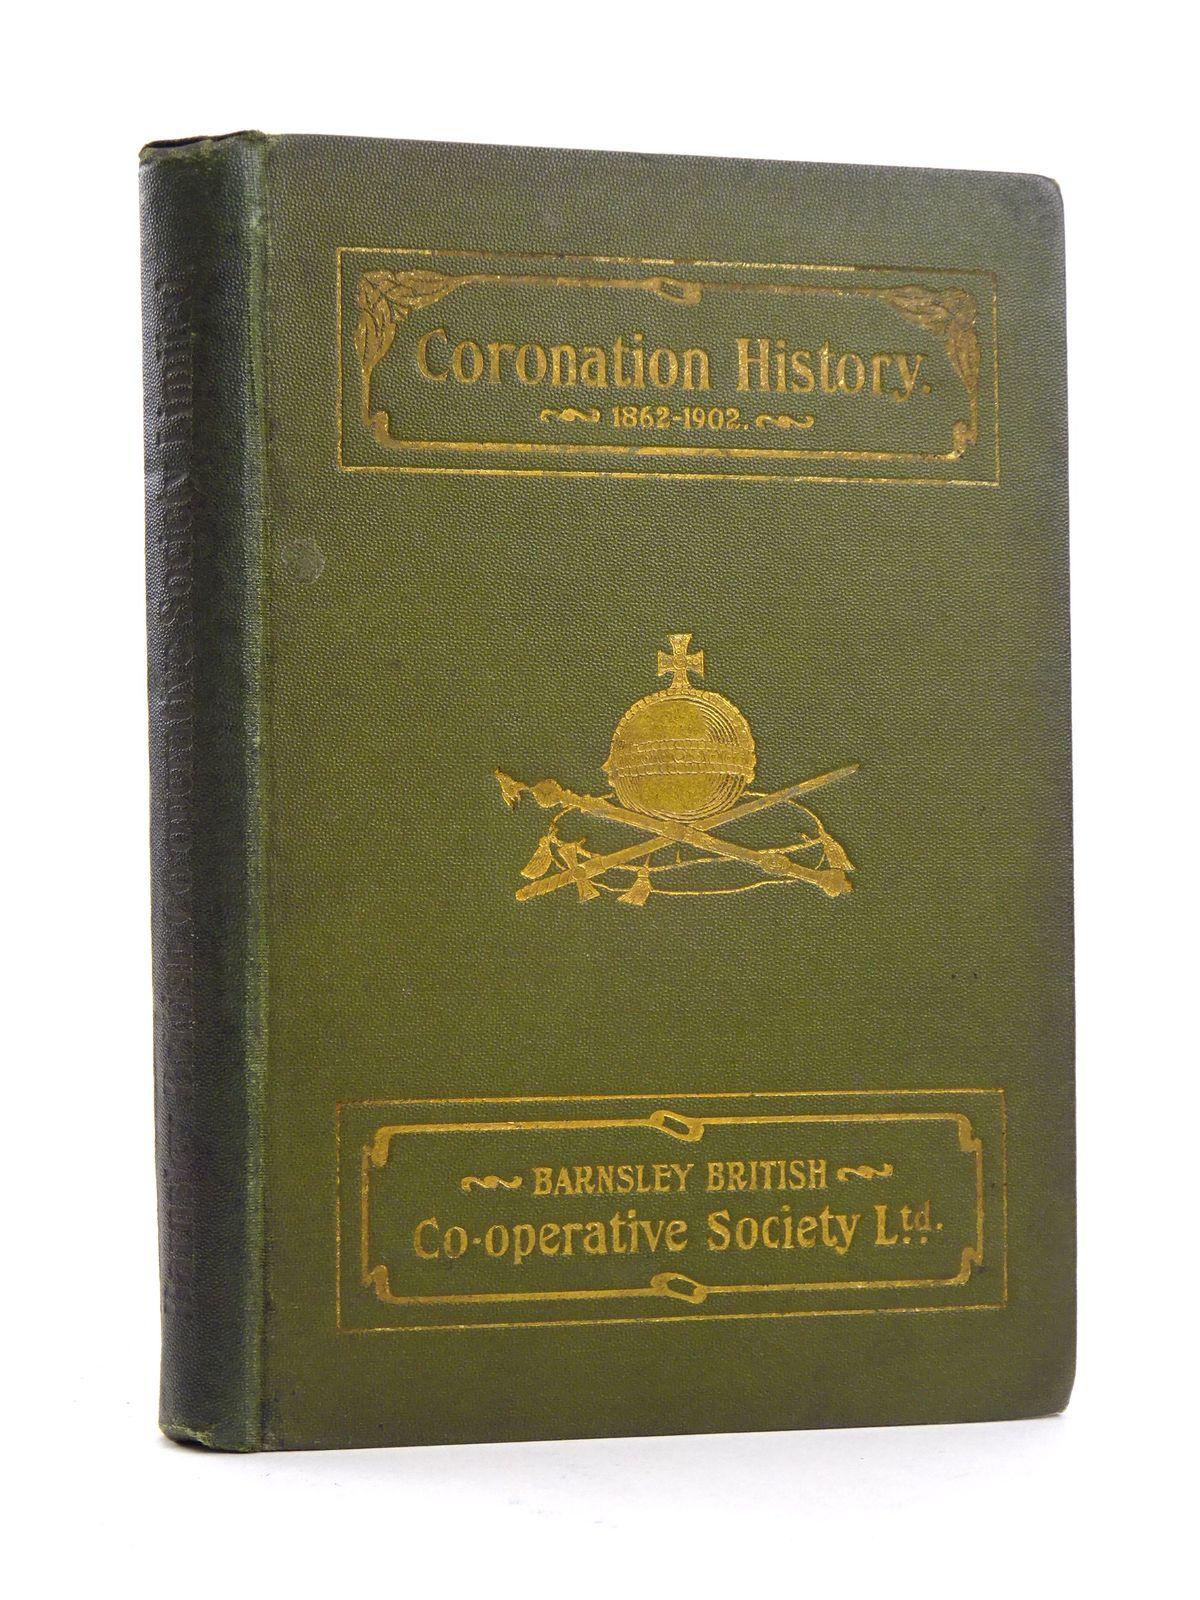 Photo of THE CORONATION HISTORY OF THE BARNSLEY BRITISH CO-OPERATIVE SOCIETY LIMITED 1862-1902